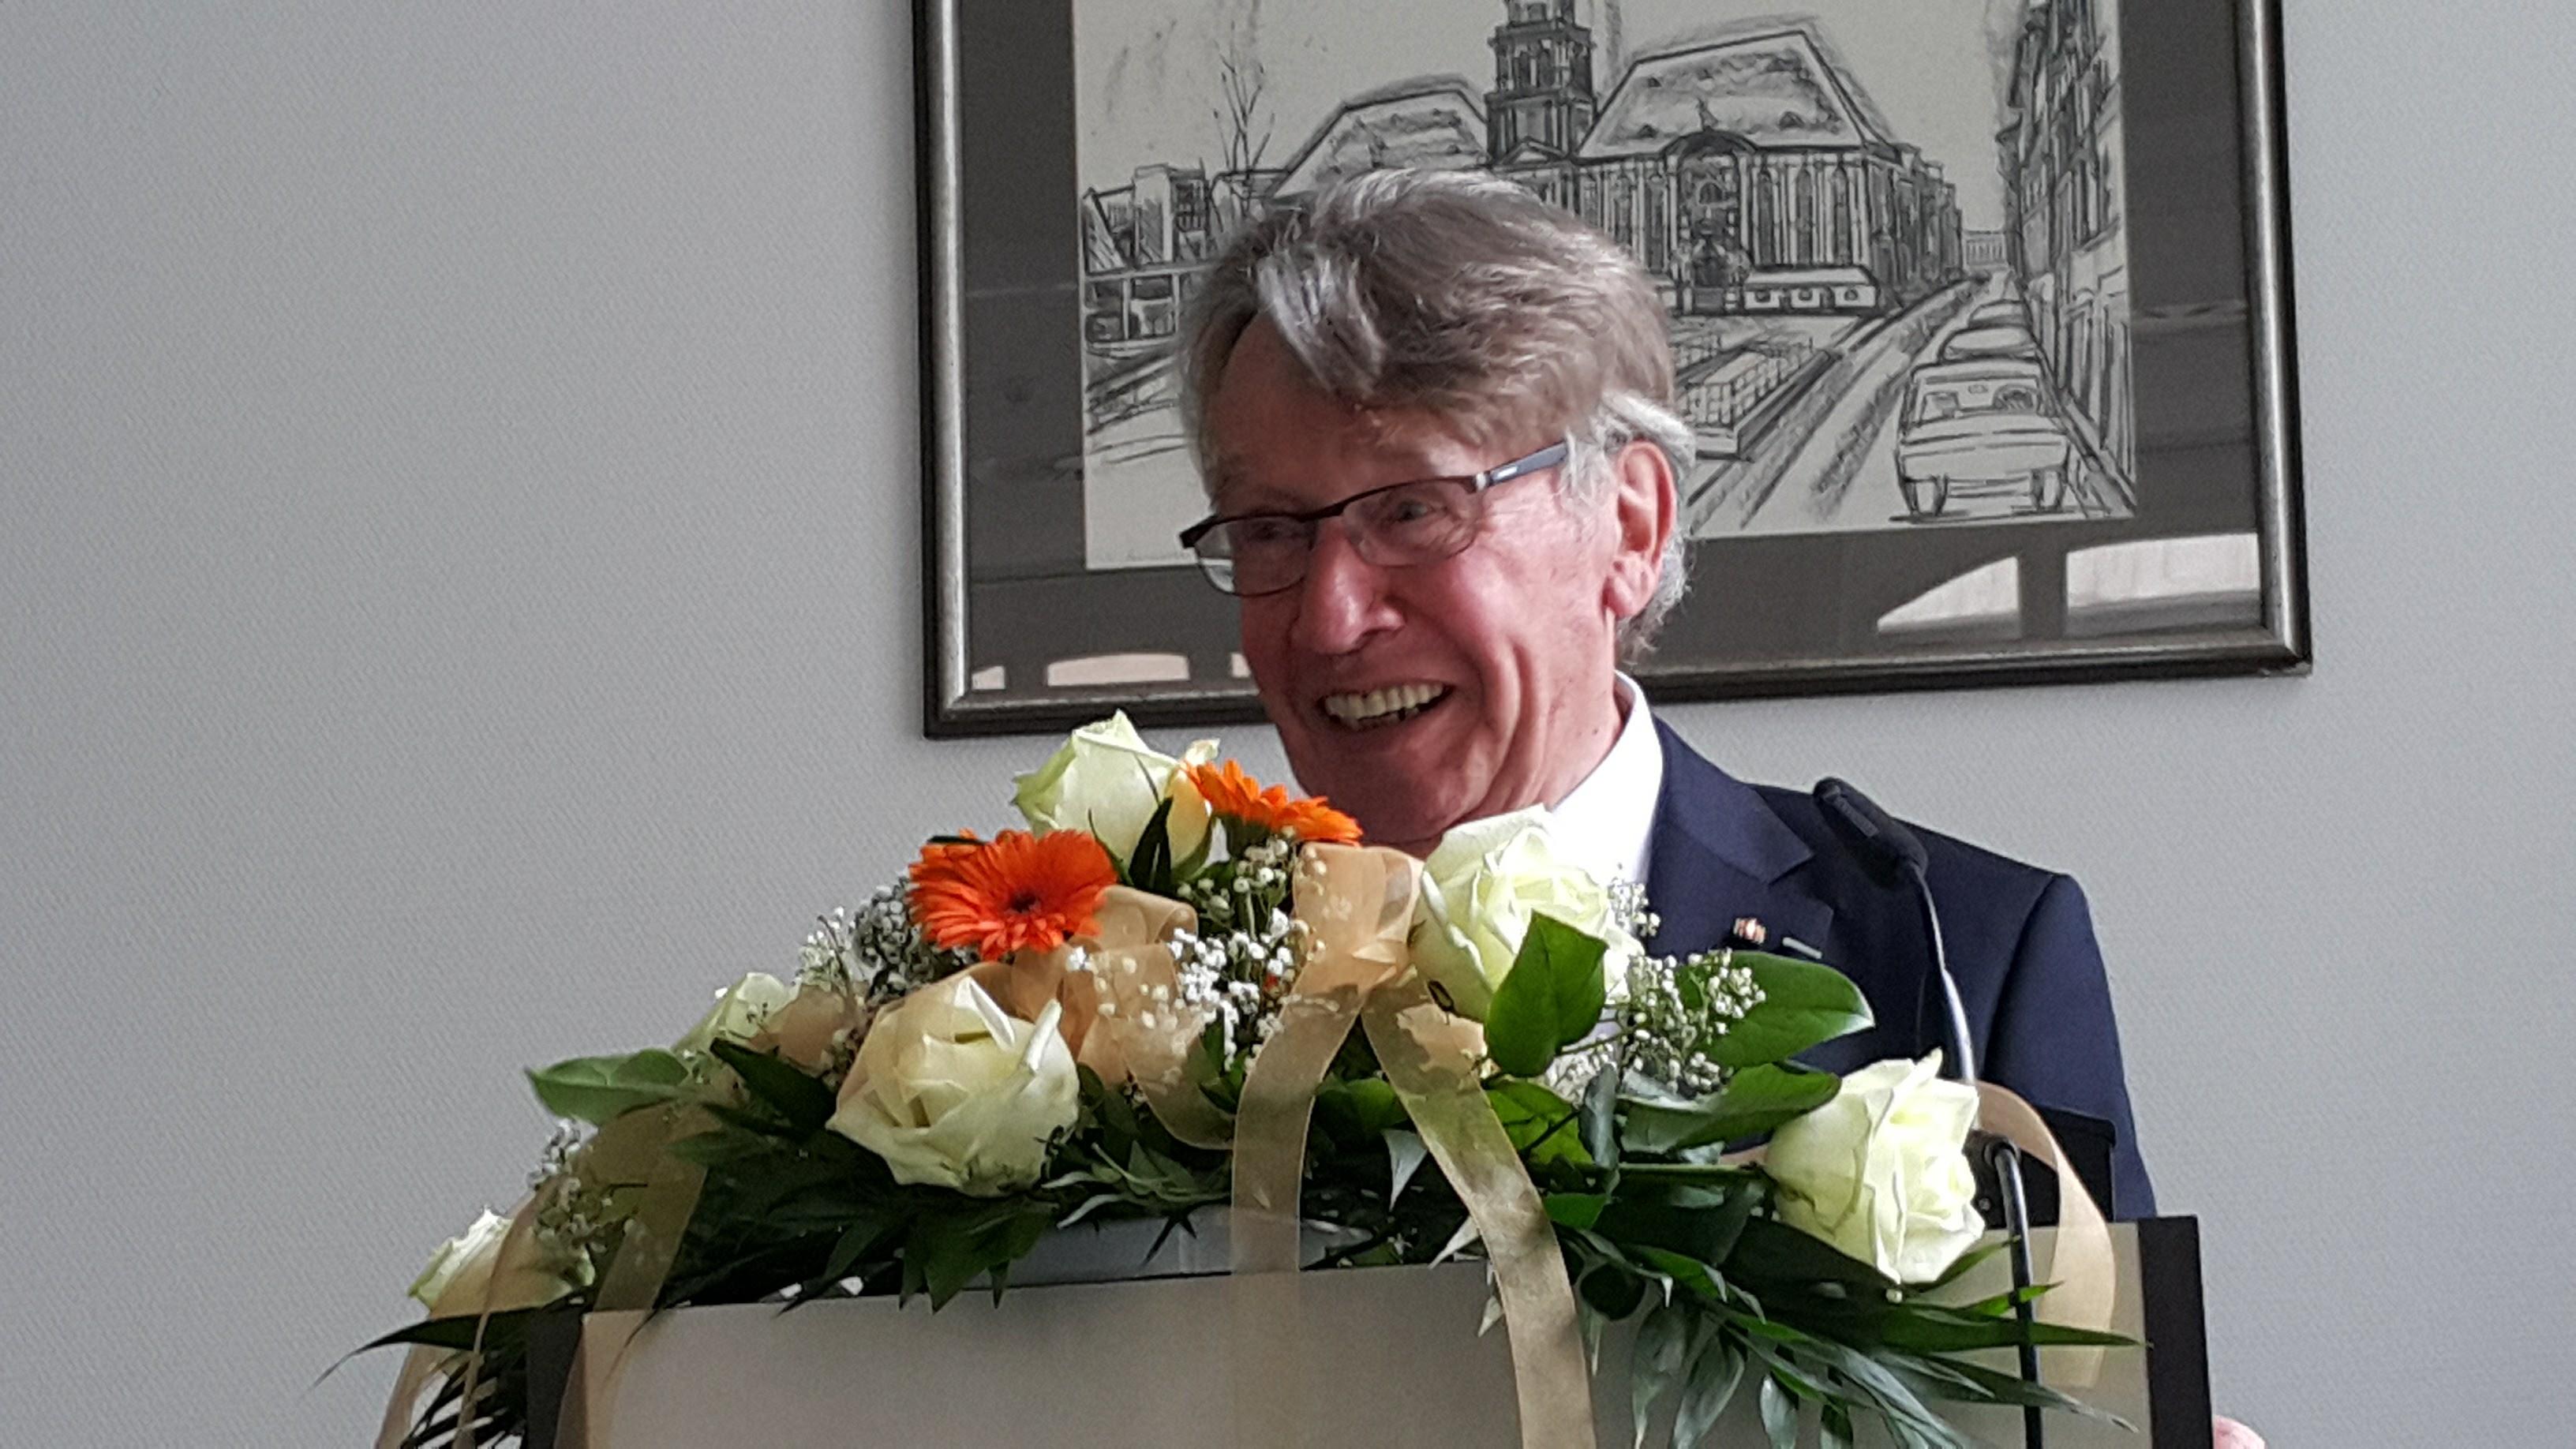 Celebration of Prof. Dr. Gerhard Stickel's 80th birthday at IDS